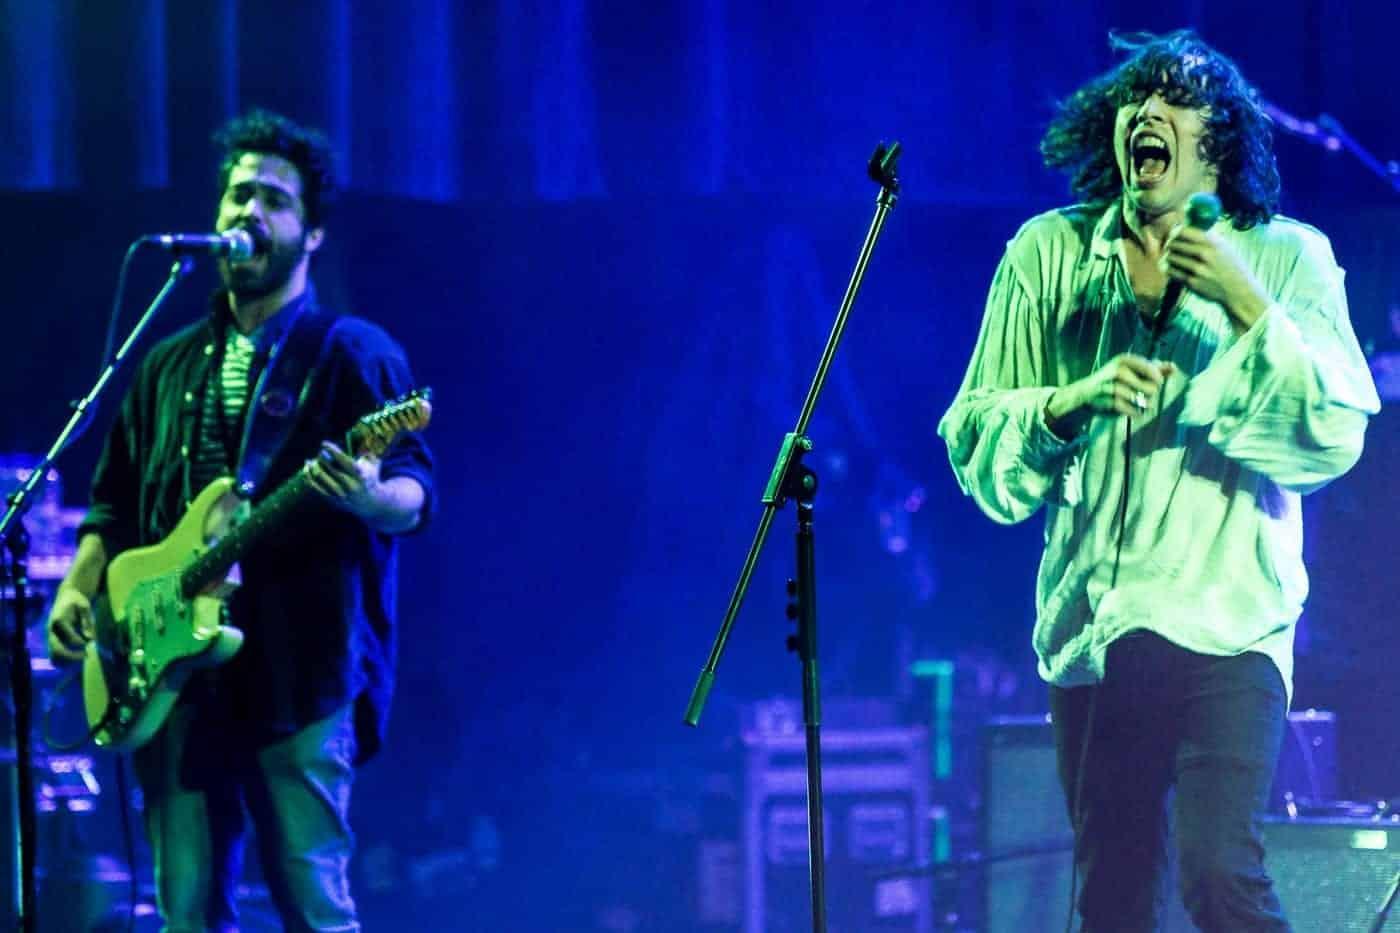 barns courtney concert photos